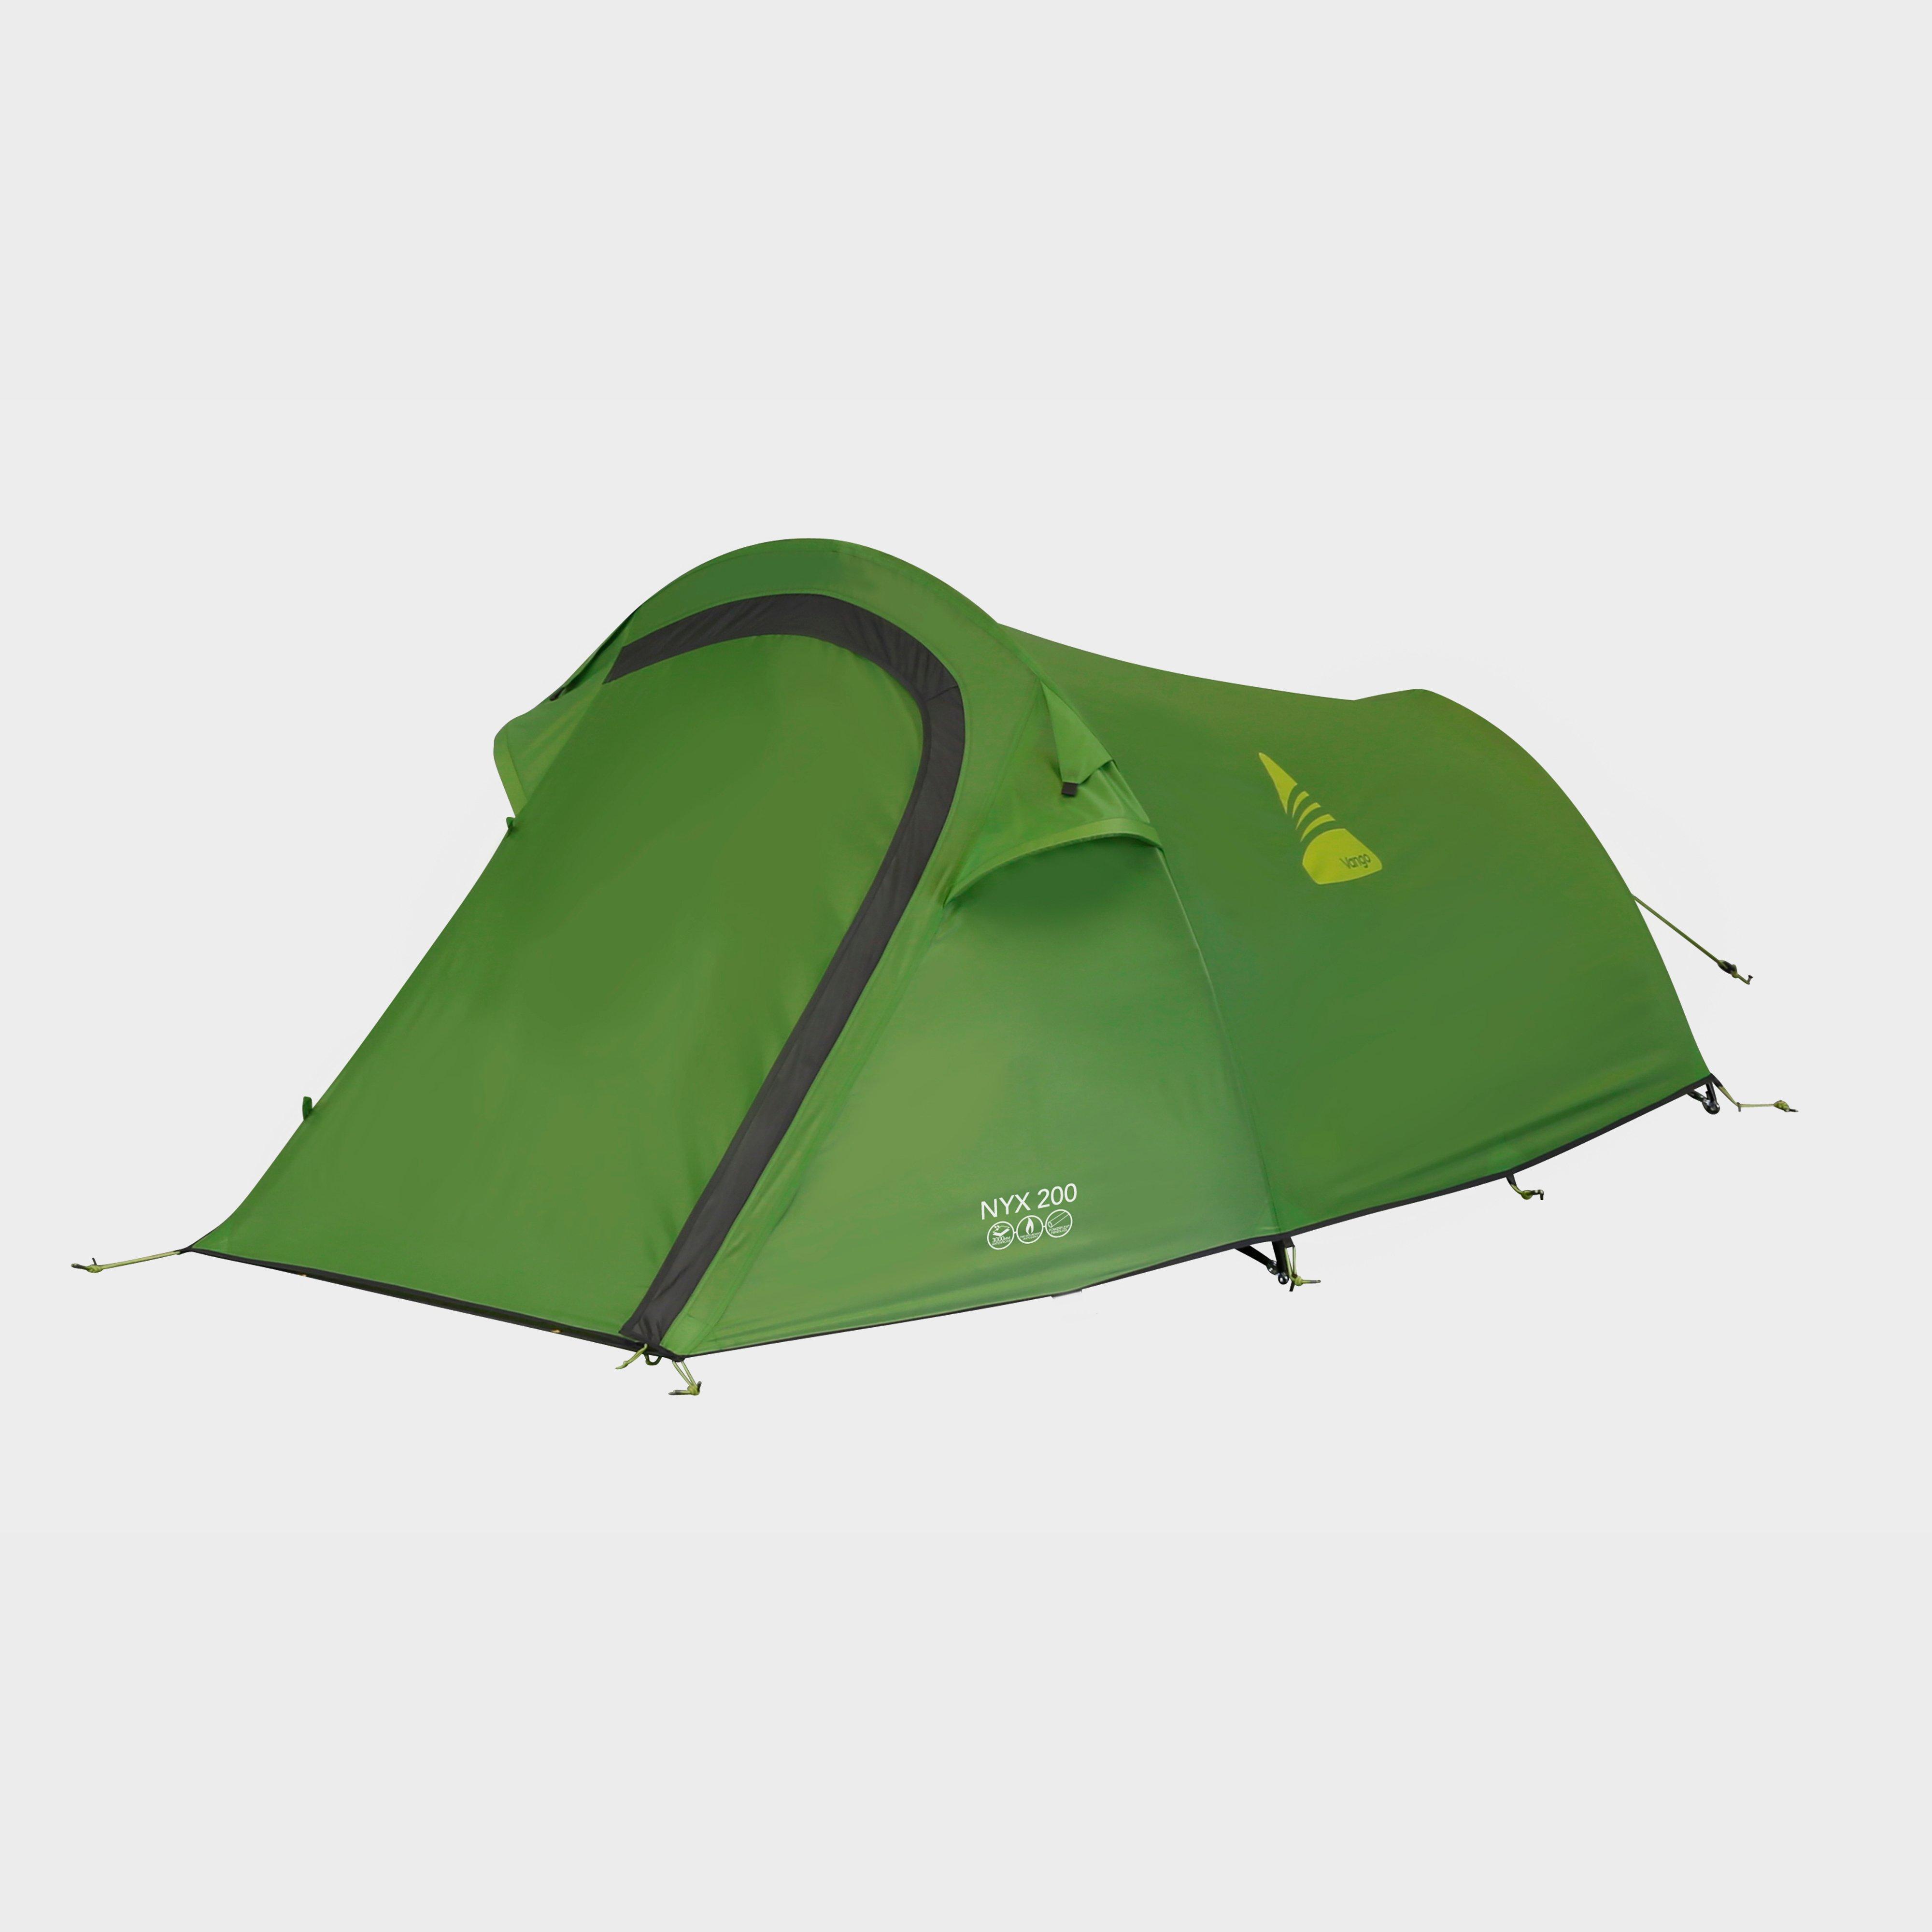 Vango Vango Nyx 200 Tent, Green